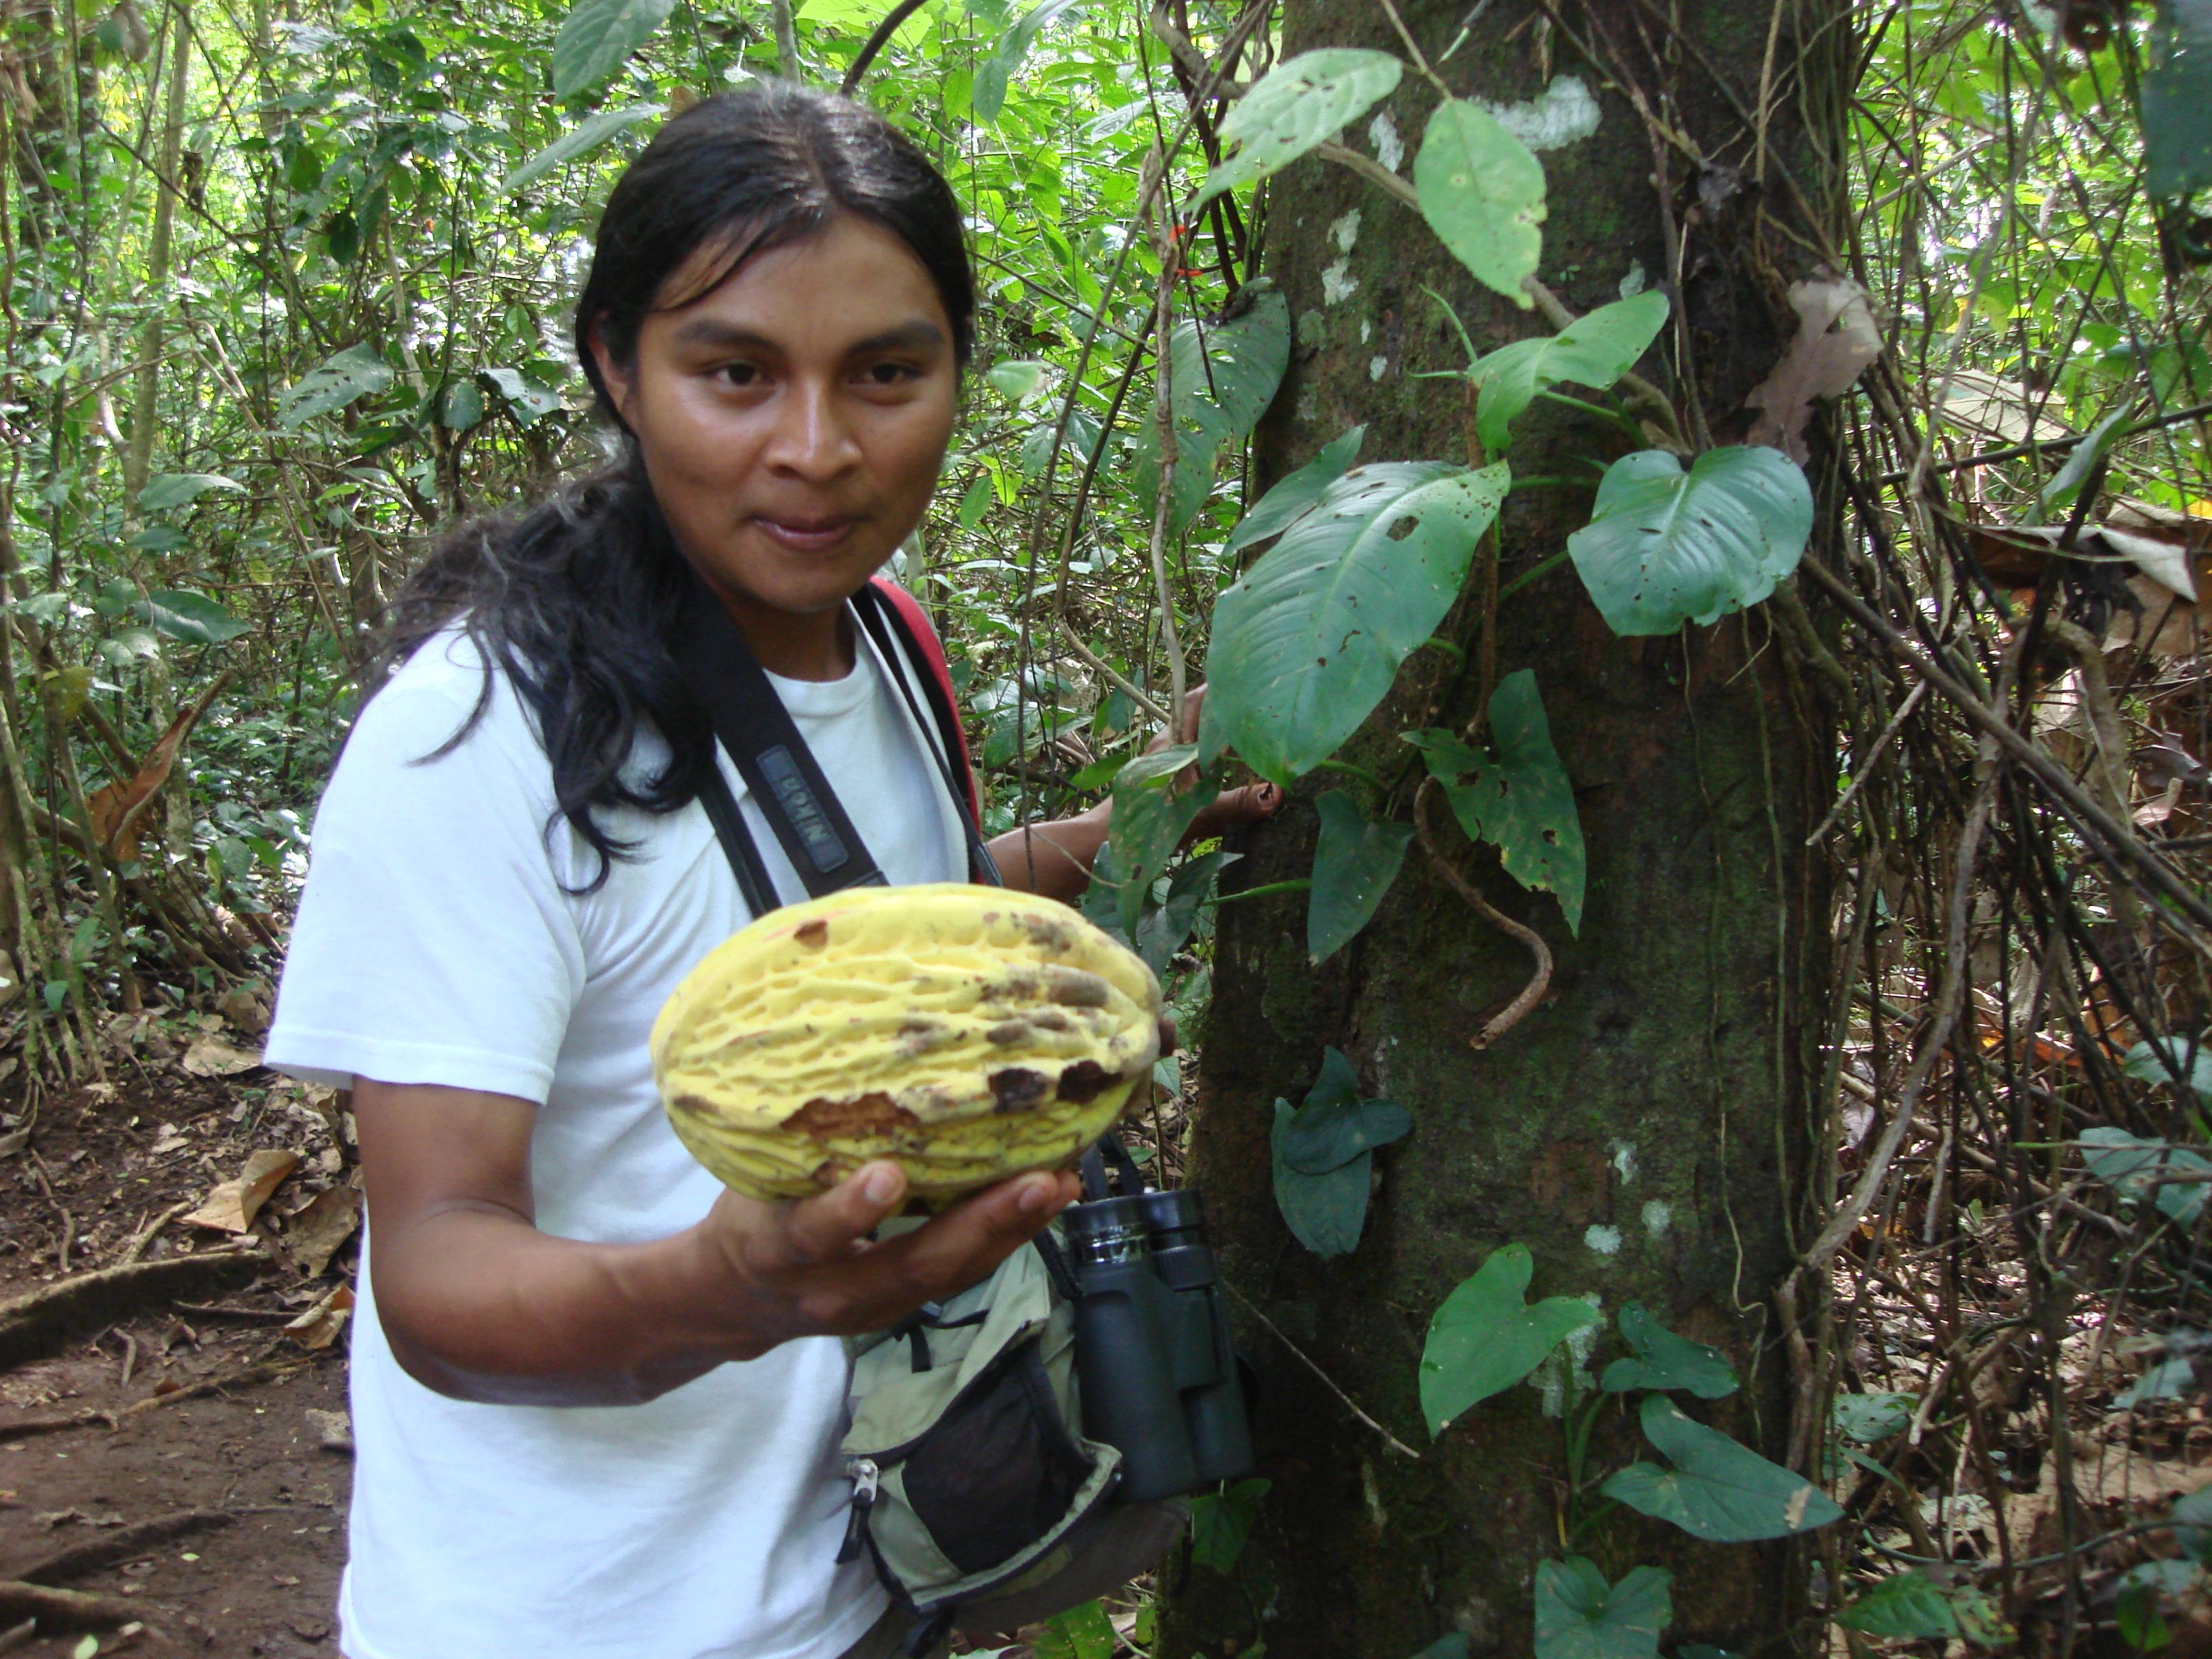 Costa rica carolyns travel stories the m4hsunfo